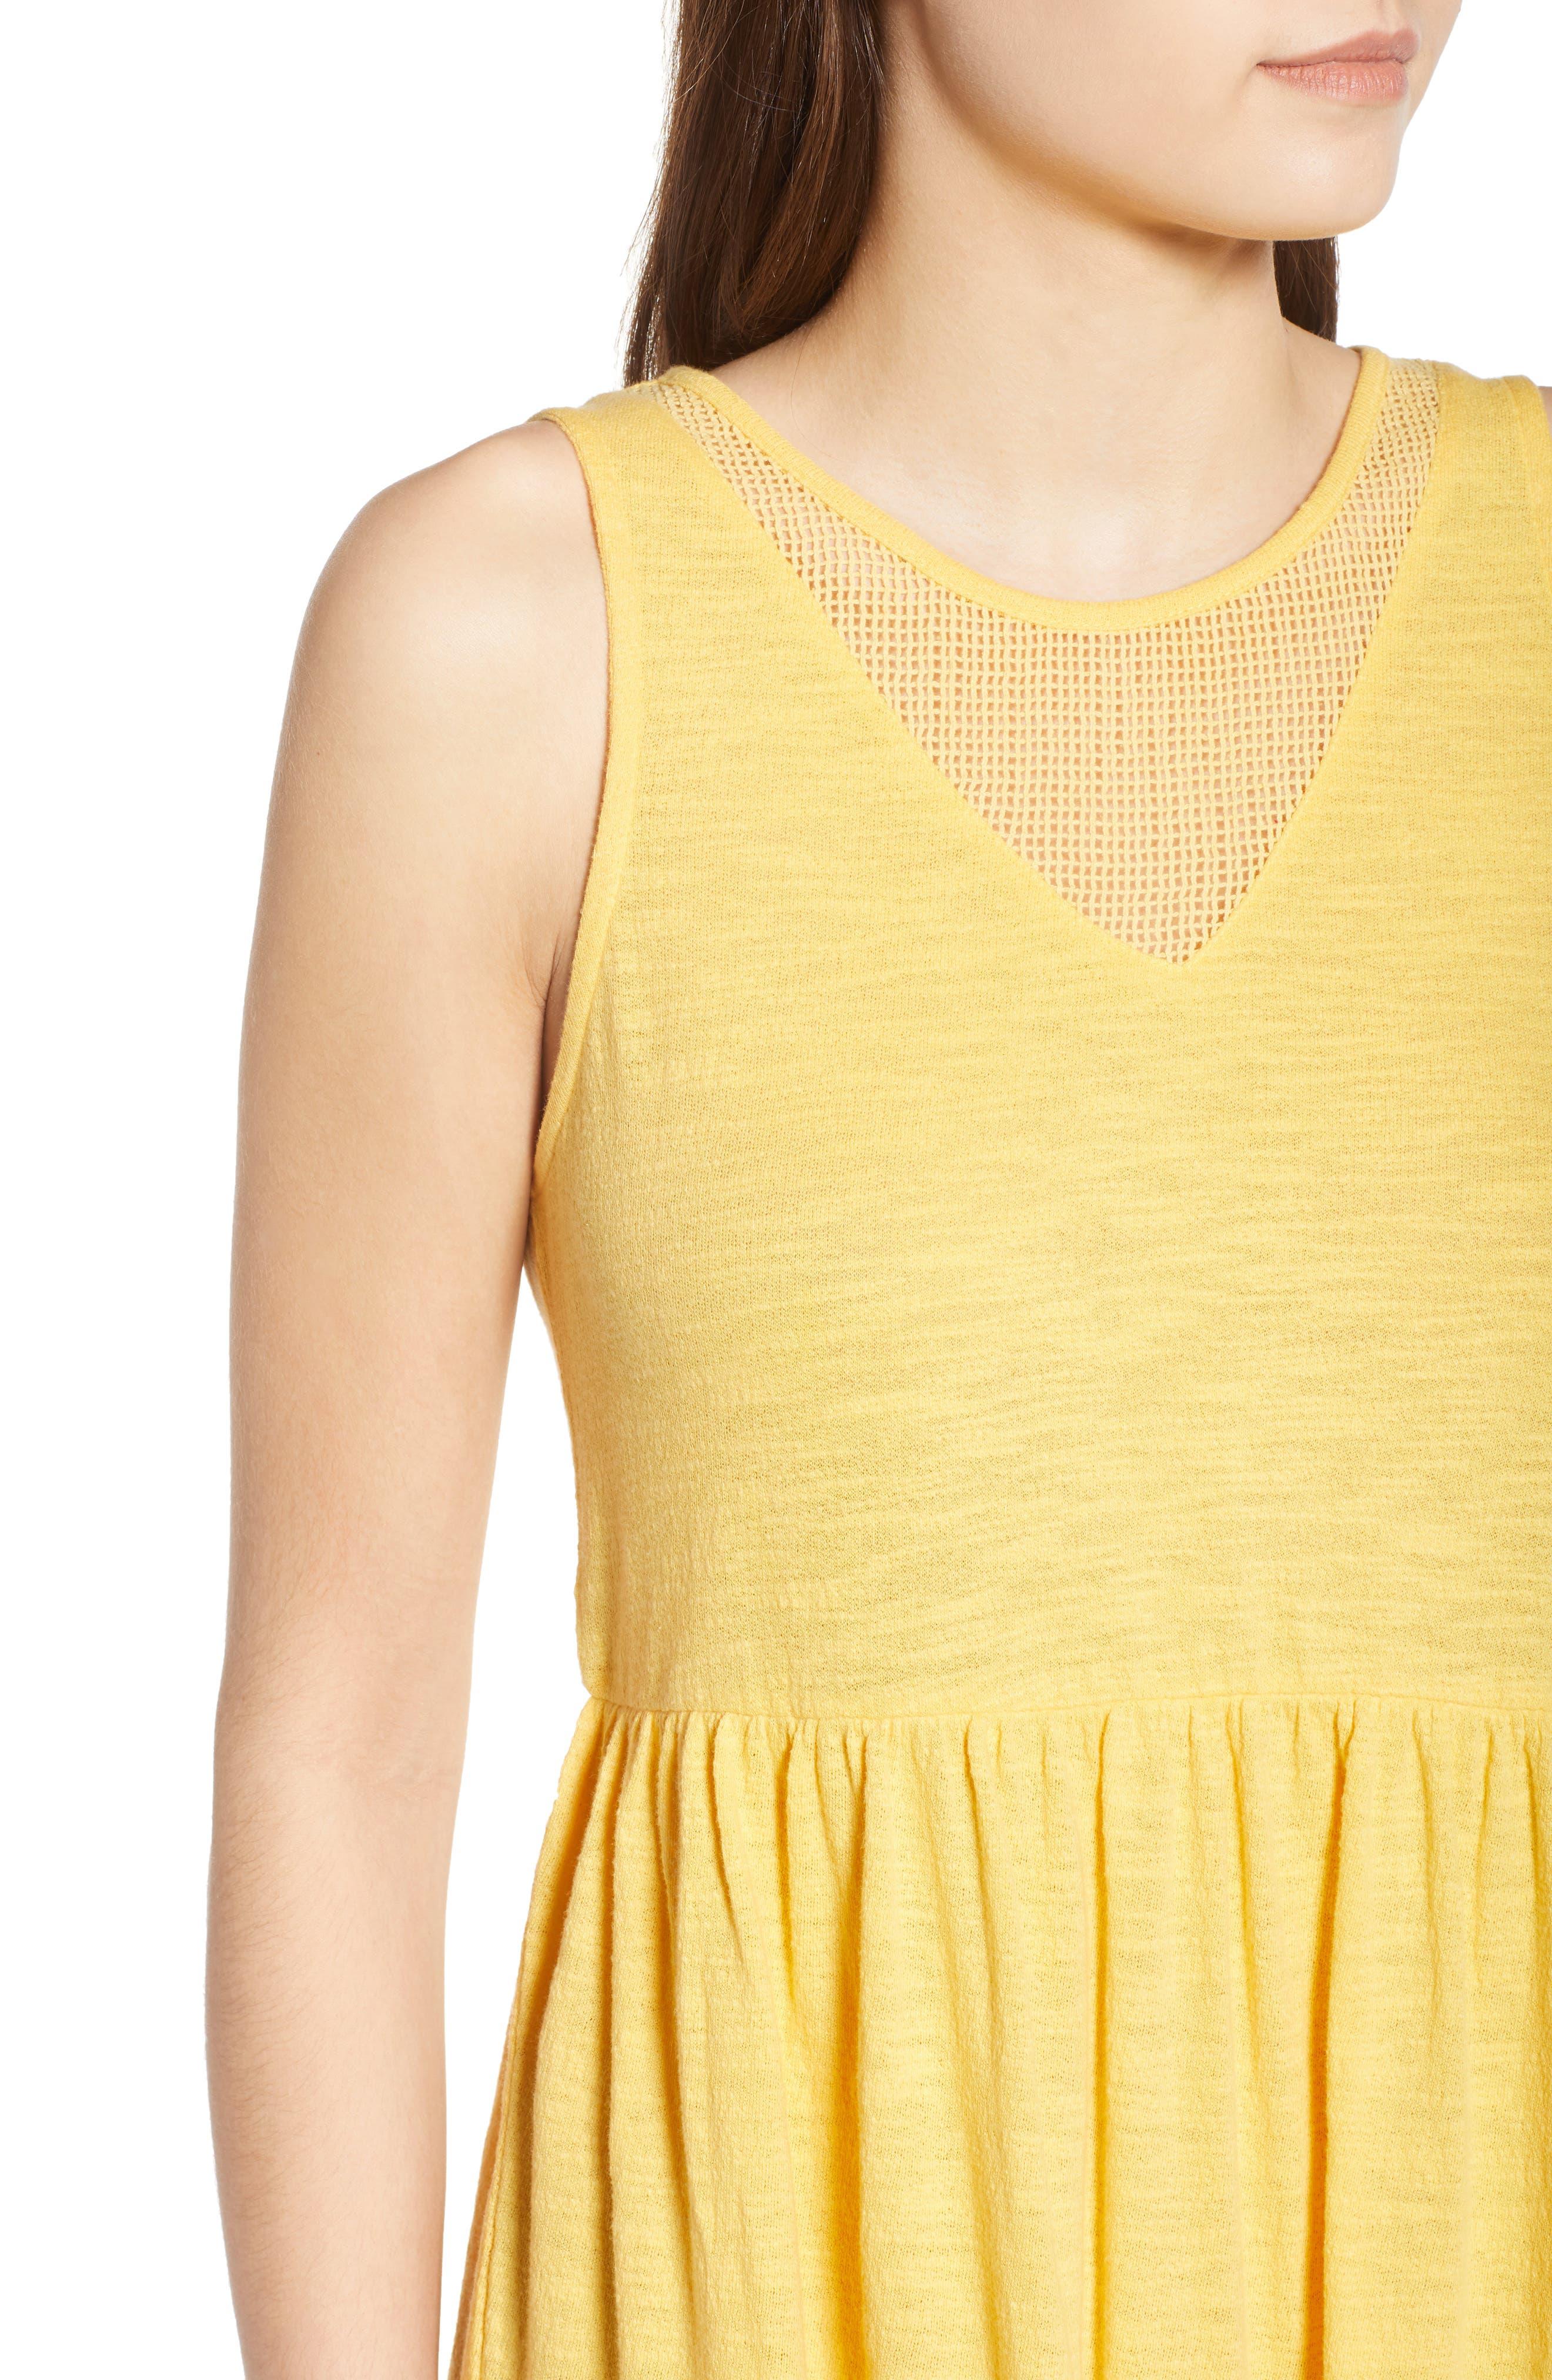 Tucson Cotton Dress,                             Alternate thumbnail 4, color,                             Buff Yellow